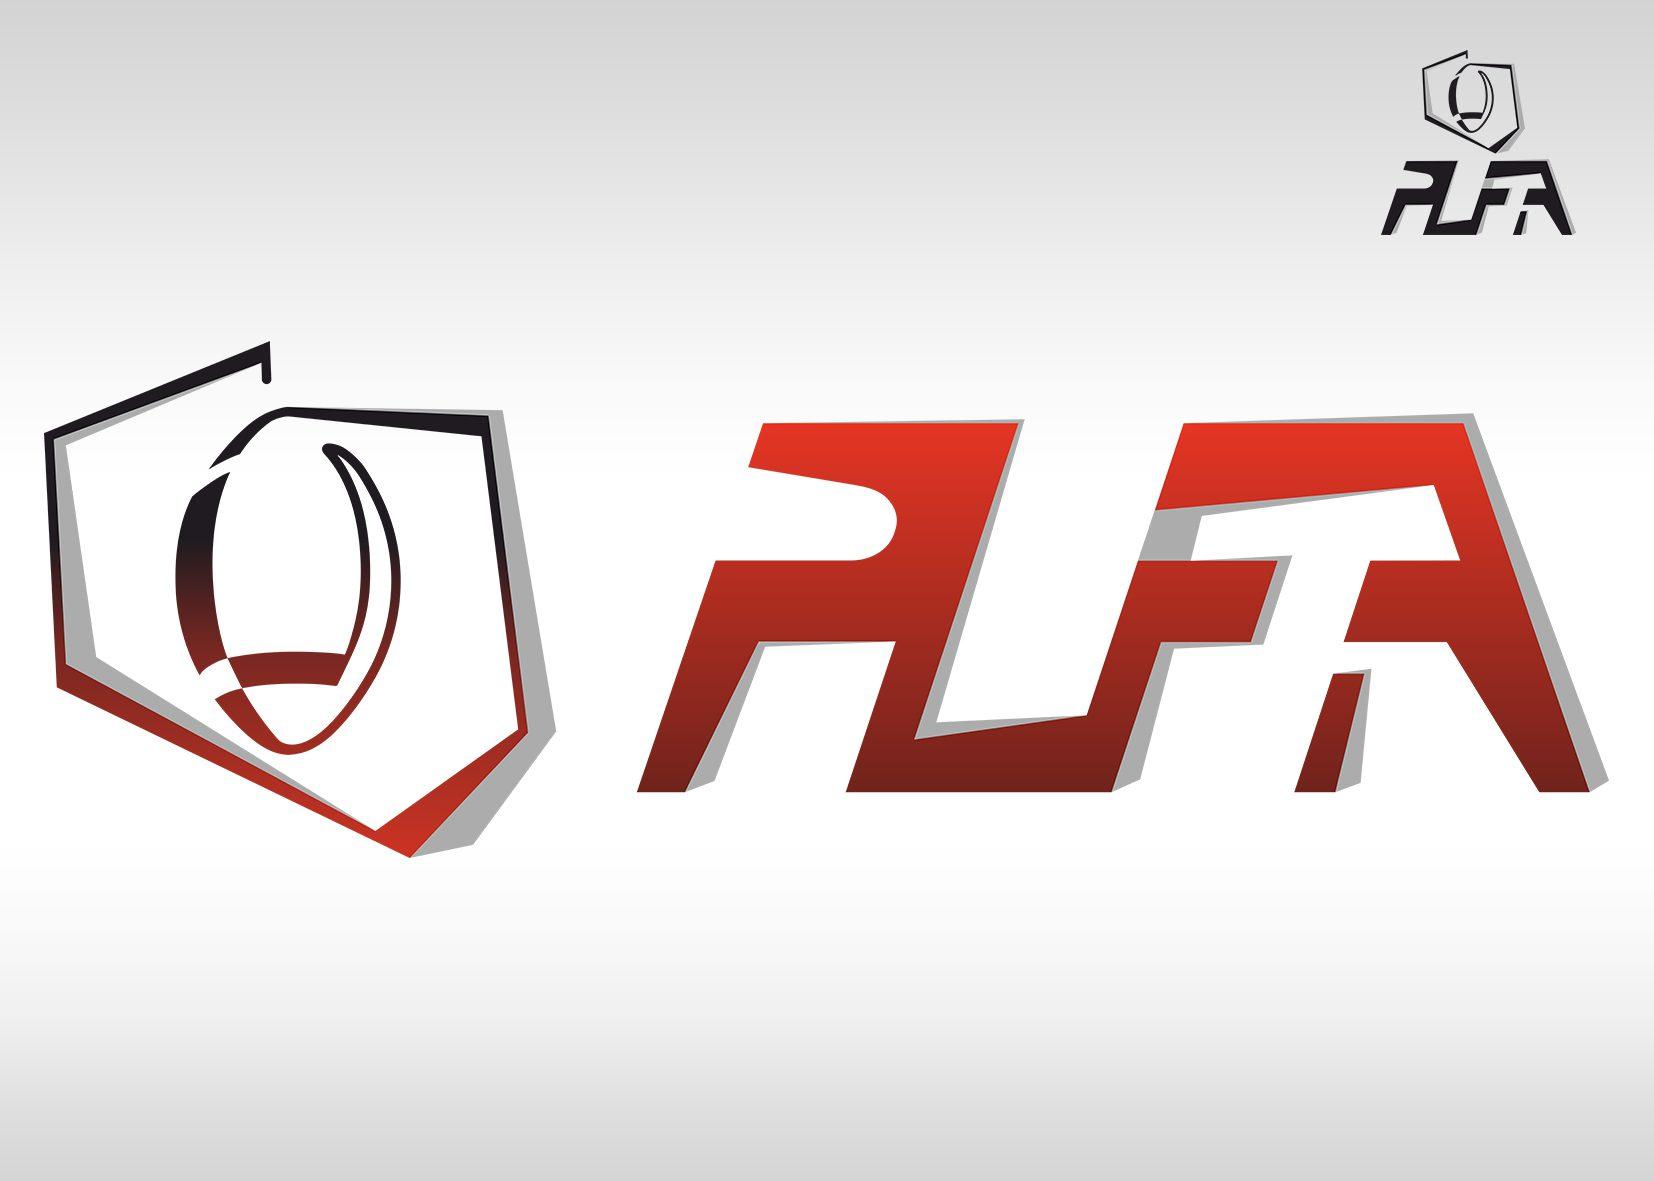 projekt graficzny logo plfa